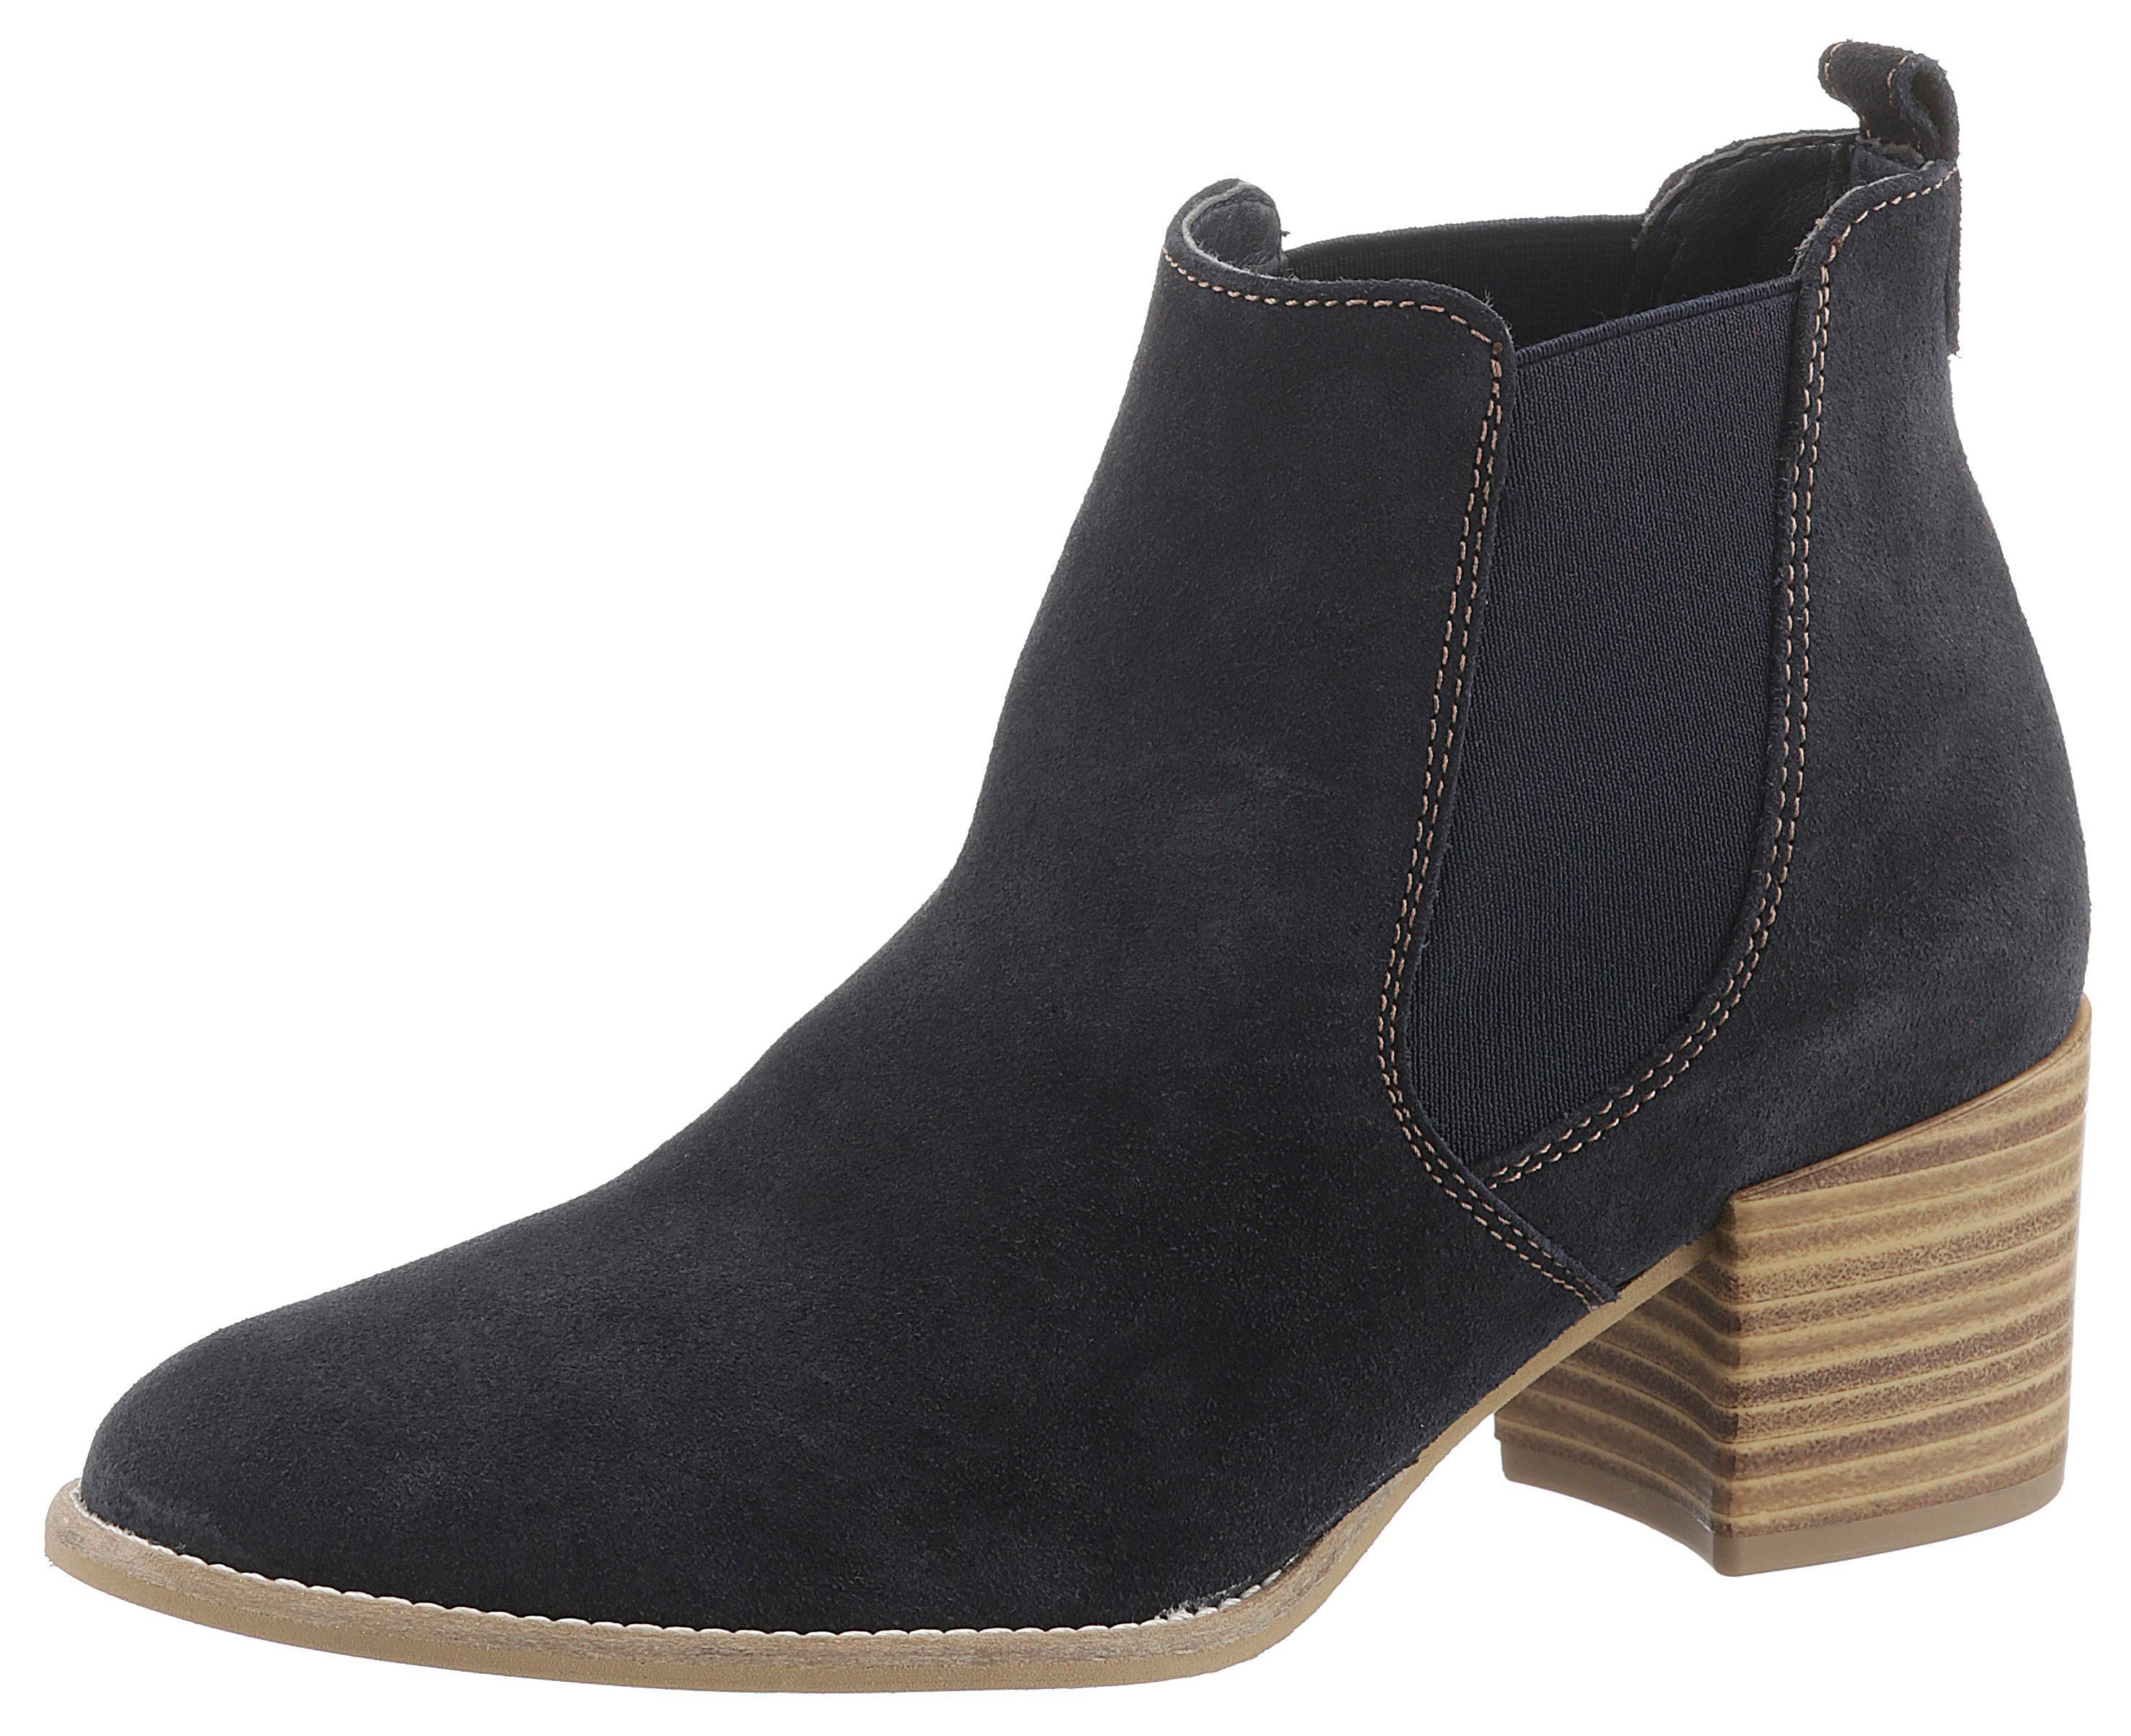 Tamaris Westernstiefelette Paula | Schuhe > Stiefel > Westernstiefel | Blau | Tamaris